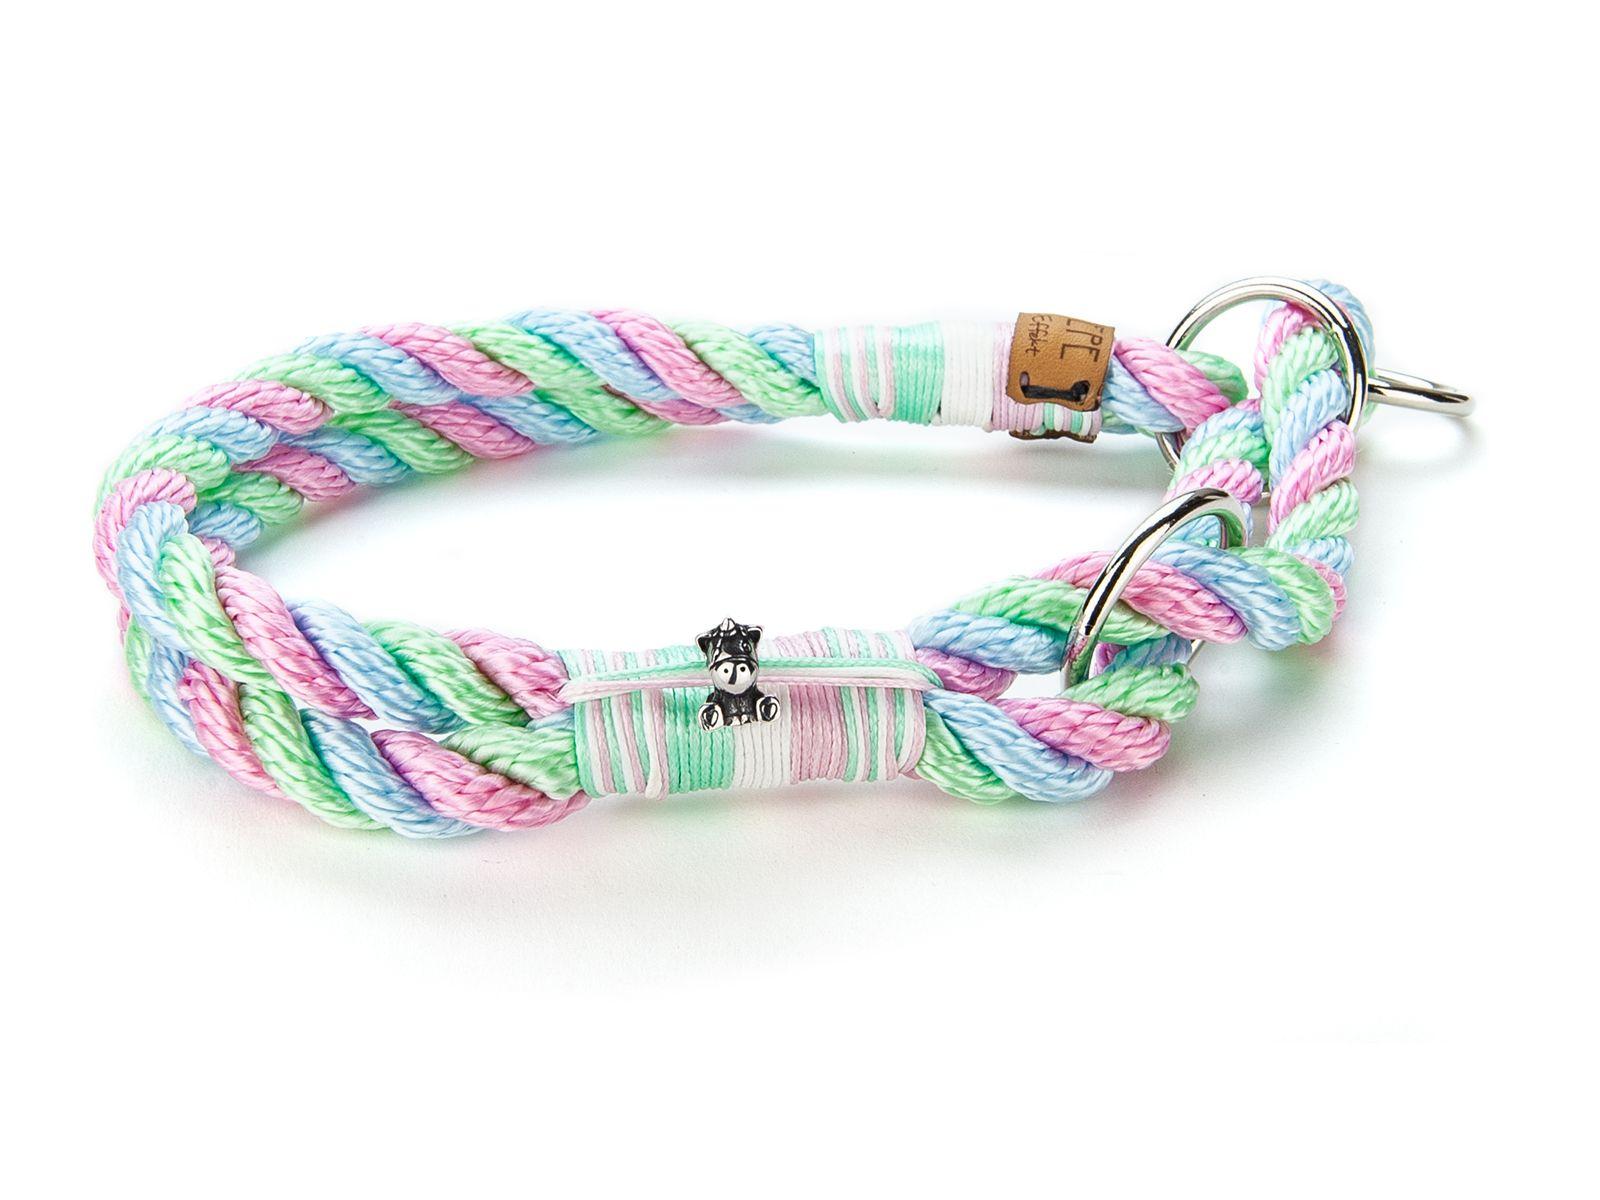 Zugstopphalsband Candy